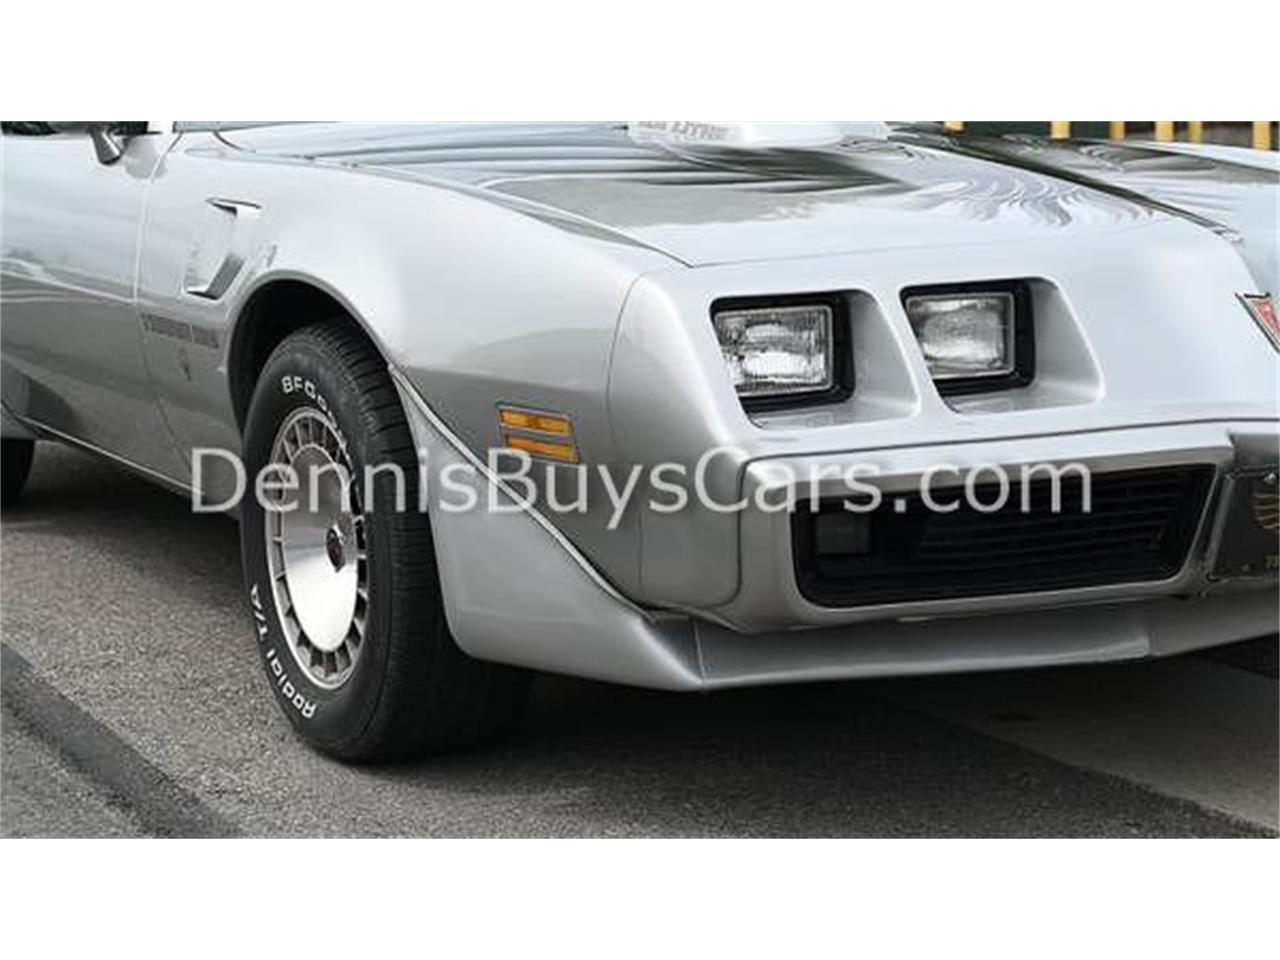 1979 Pontiac Firebird Trans Am (CC-1354399) for sale in LOS ANGELES, California